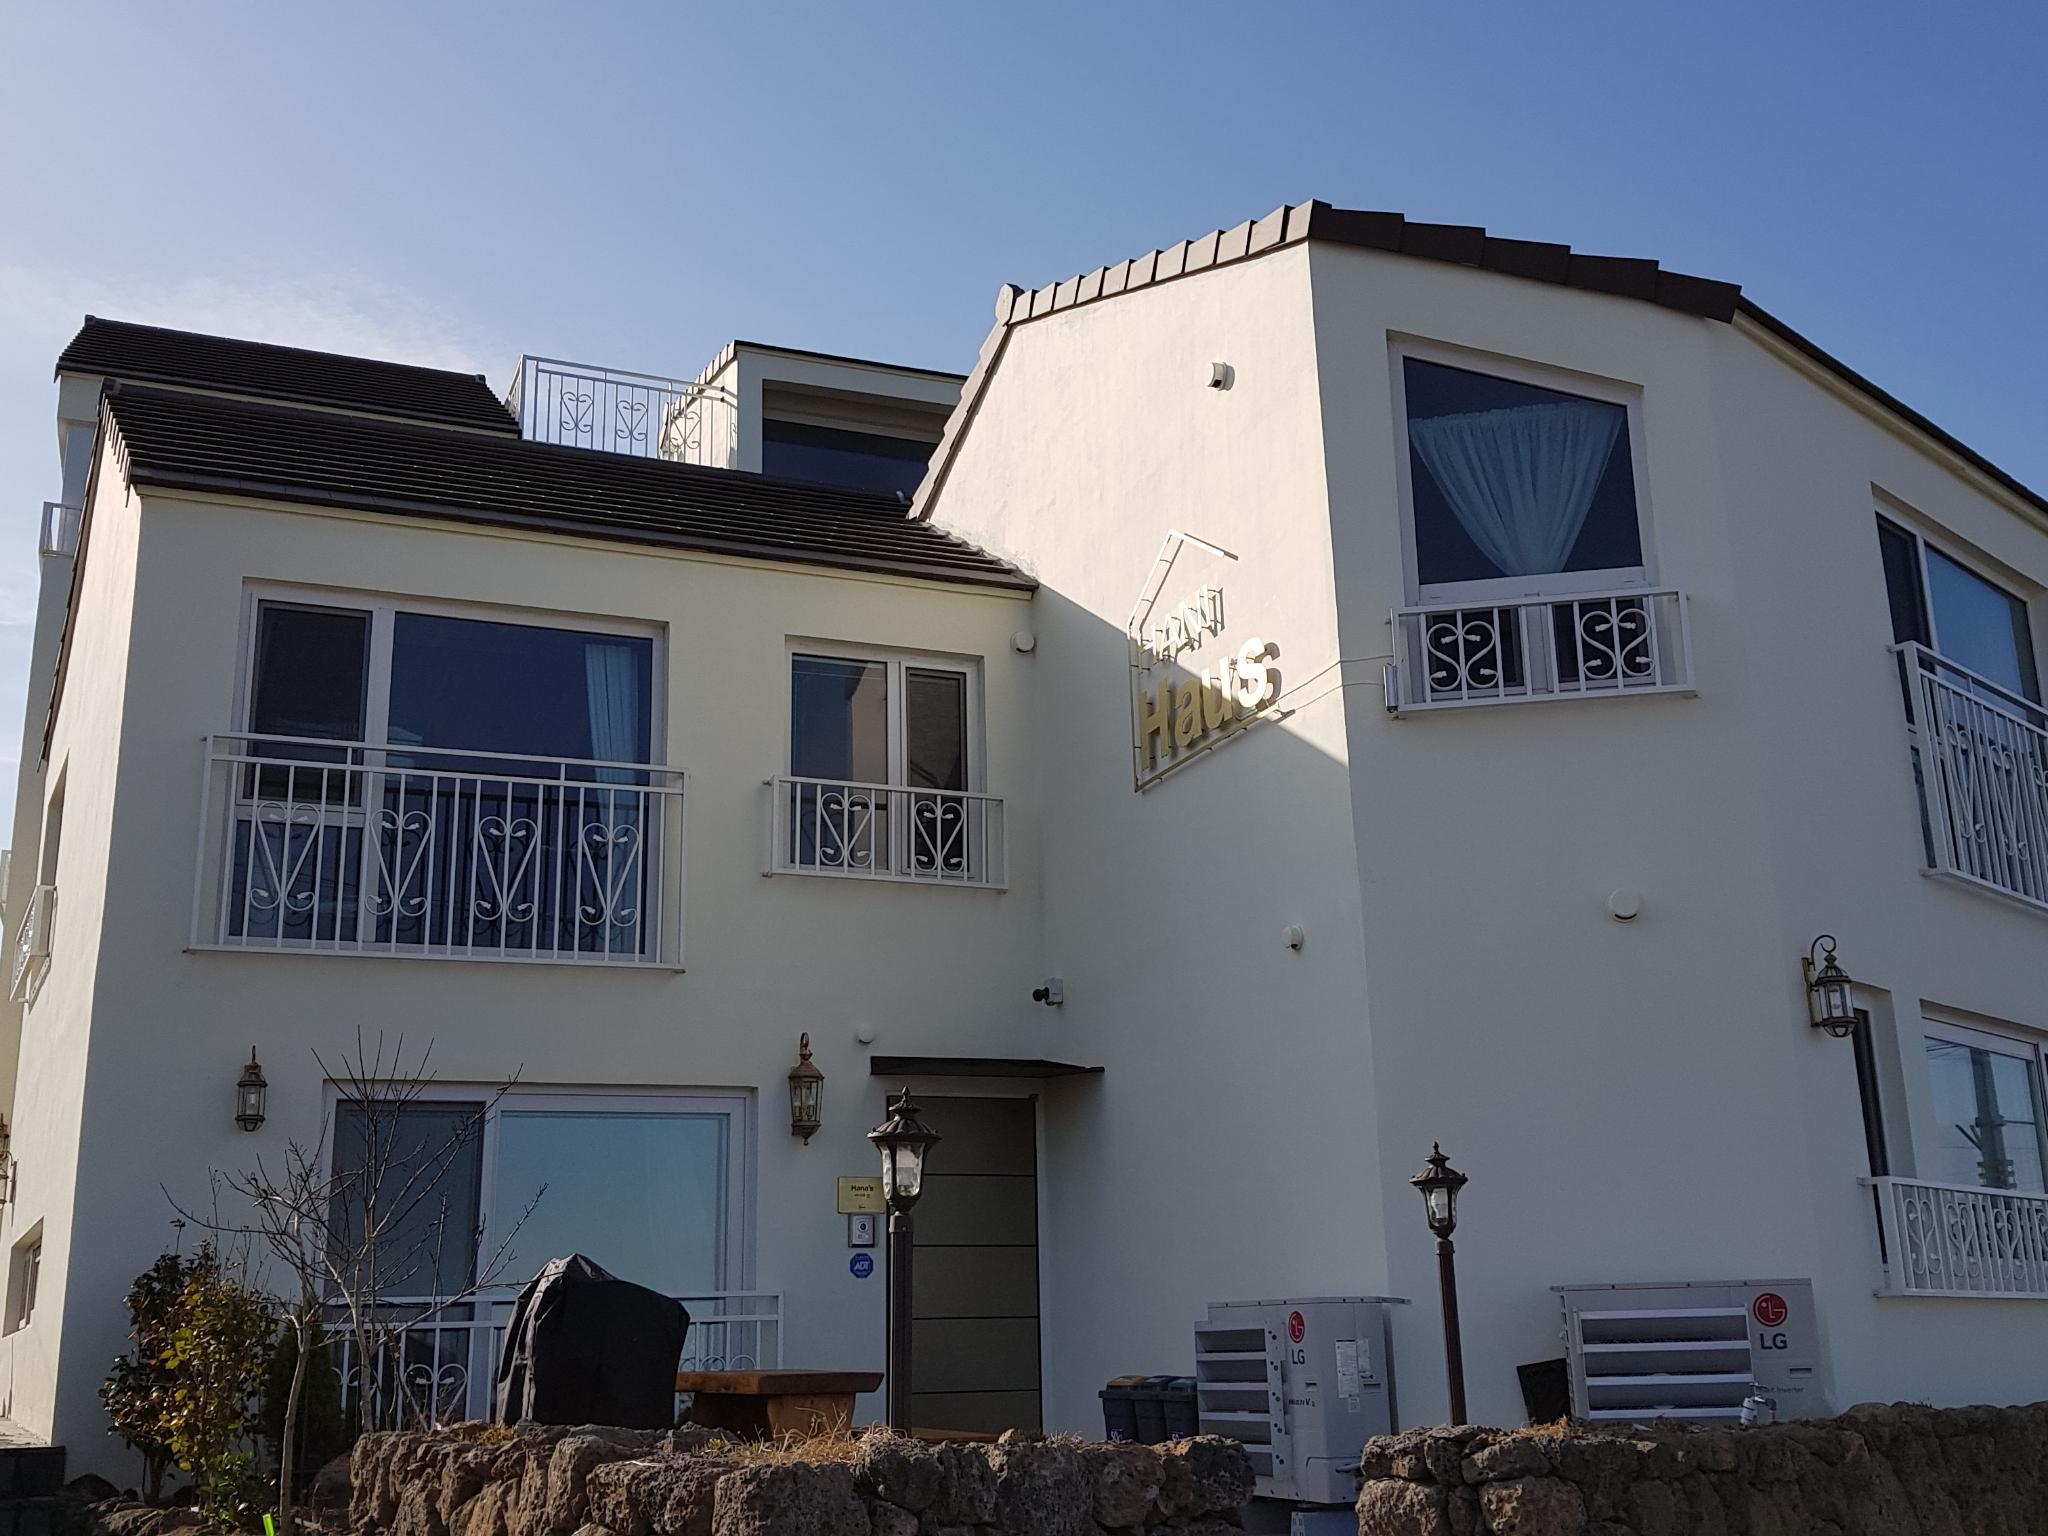 HANI Haus Hana House For Luxury Group